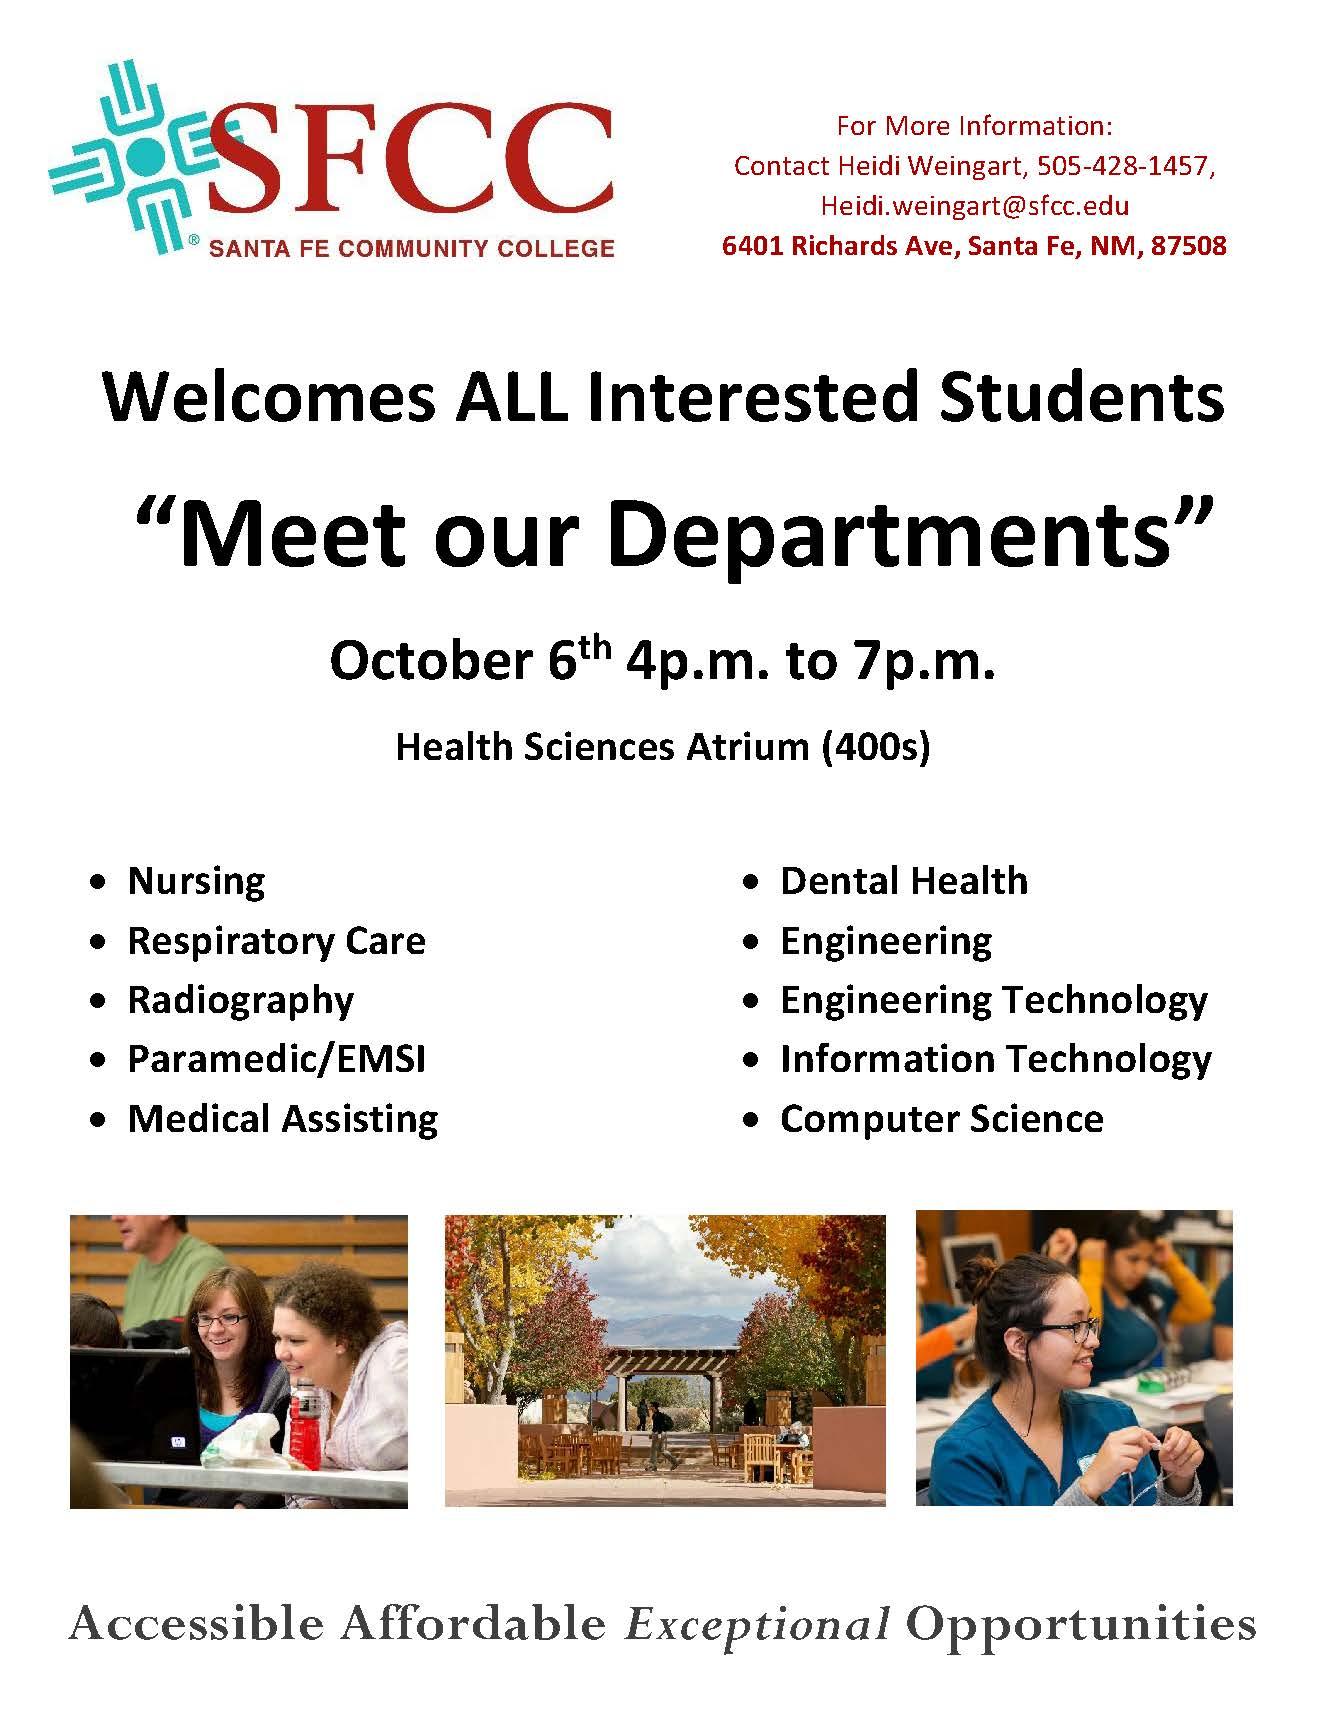 STEM health program: ITT tech students